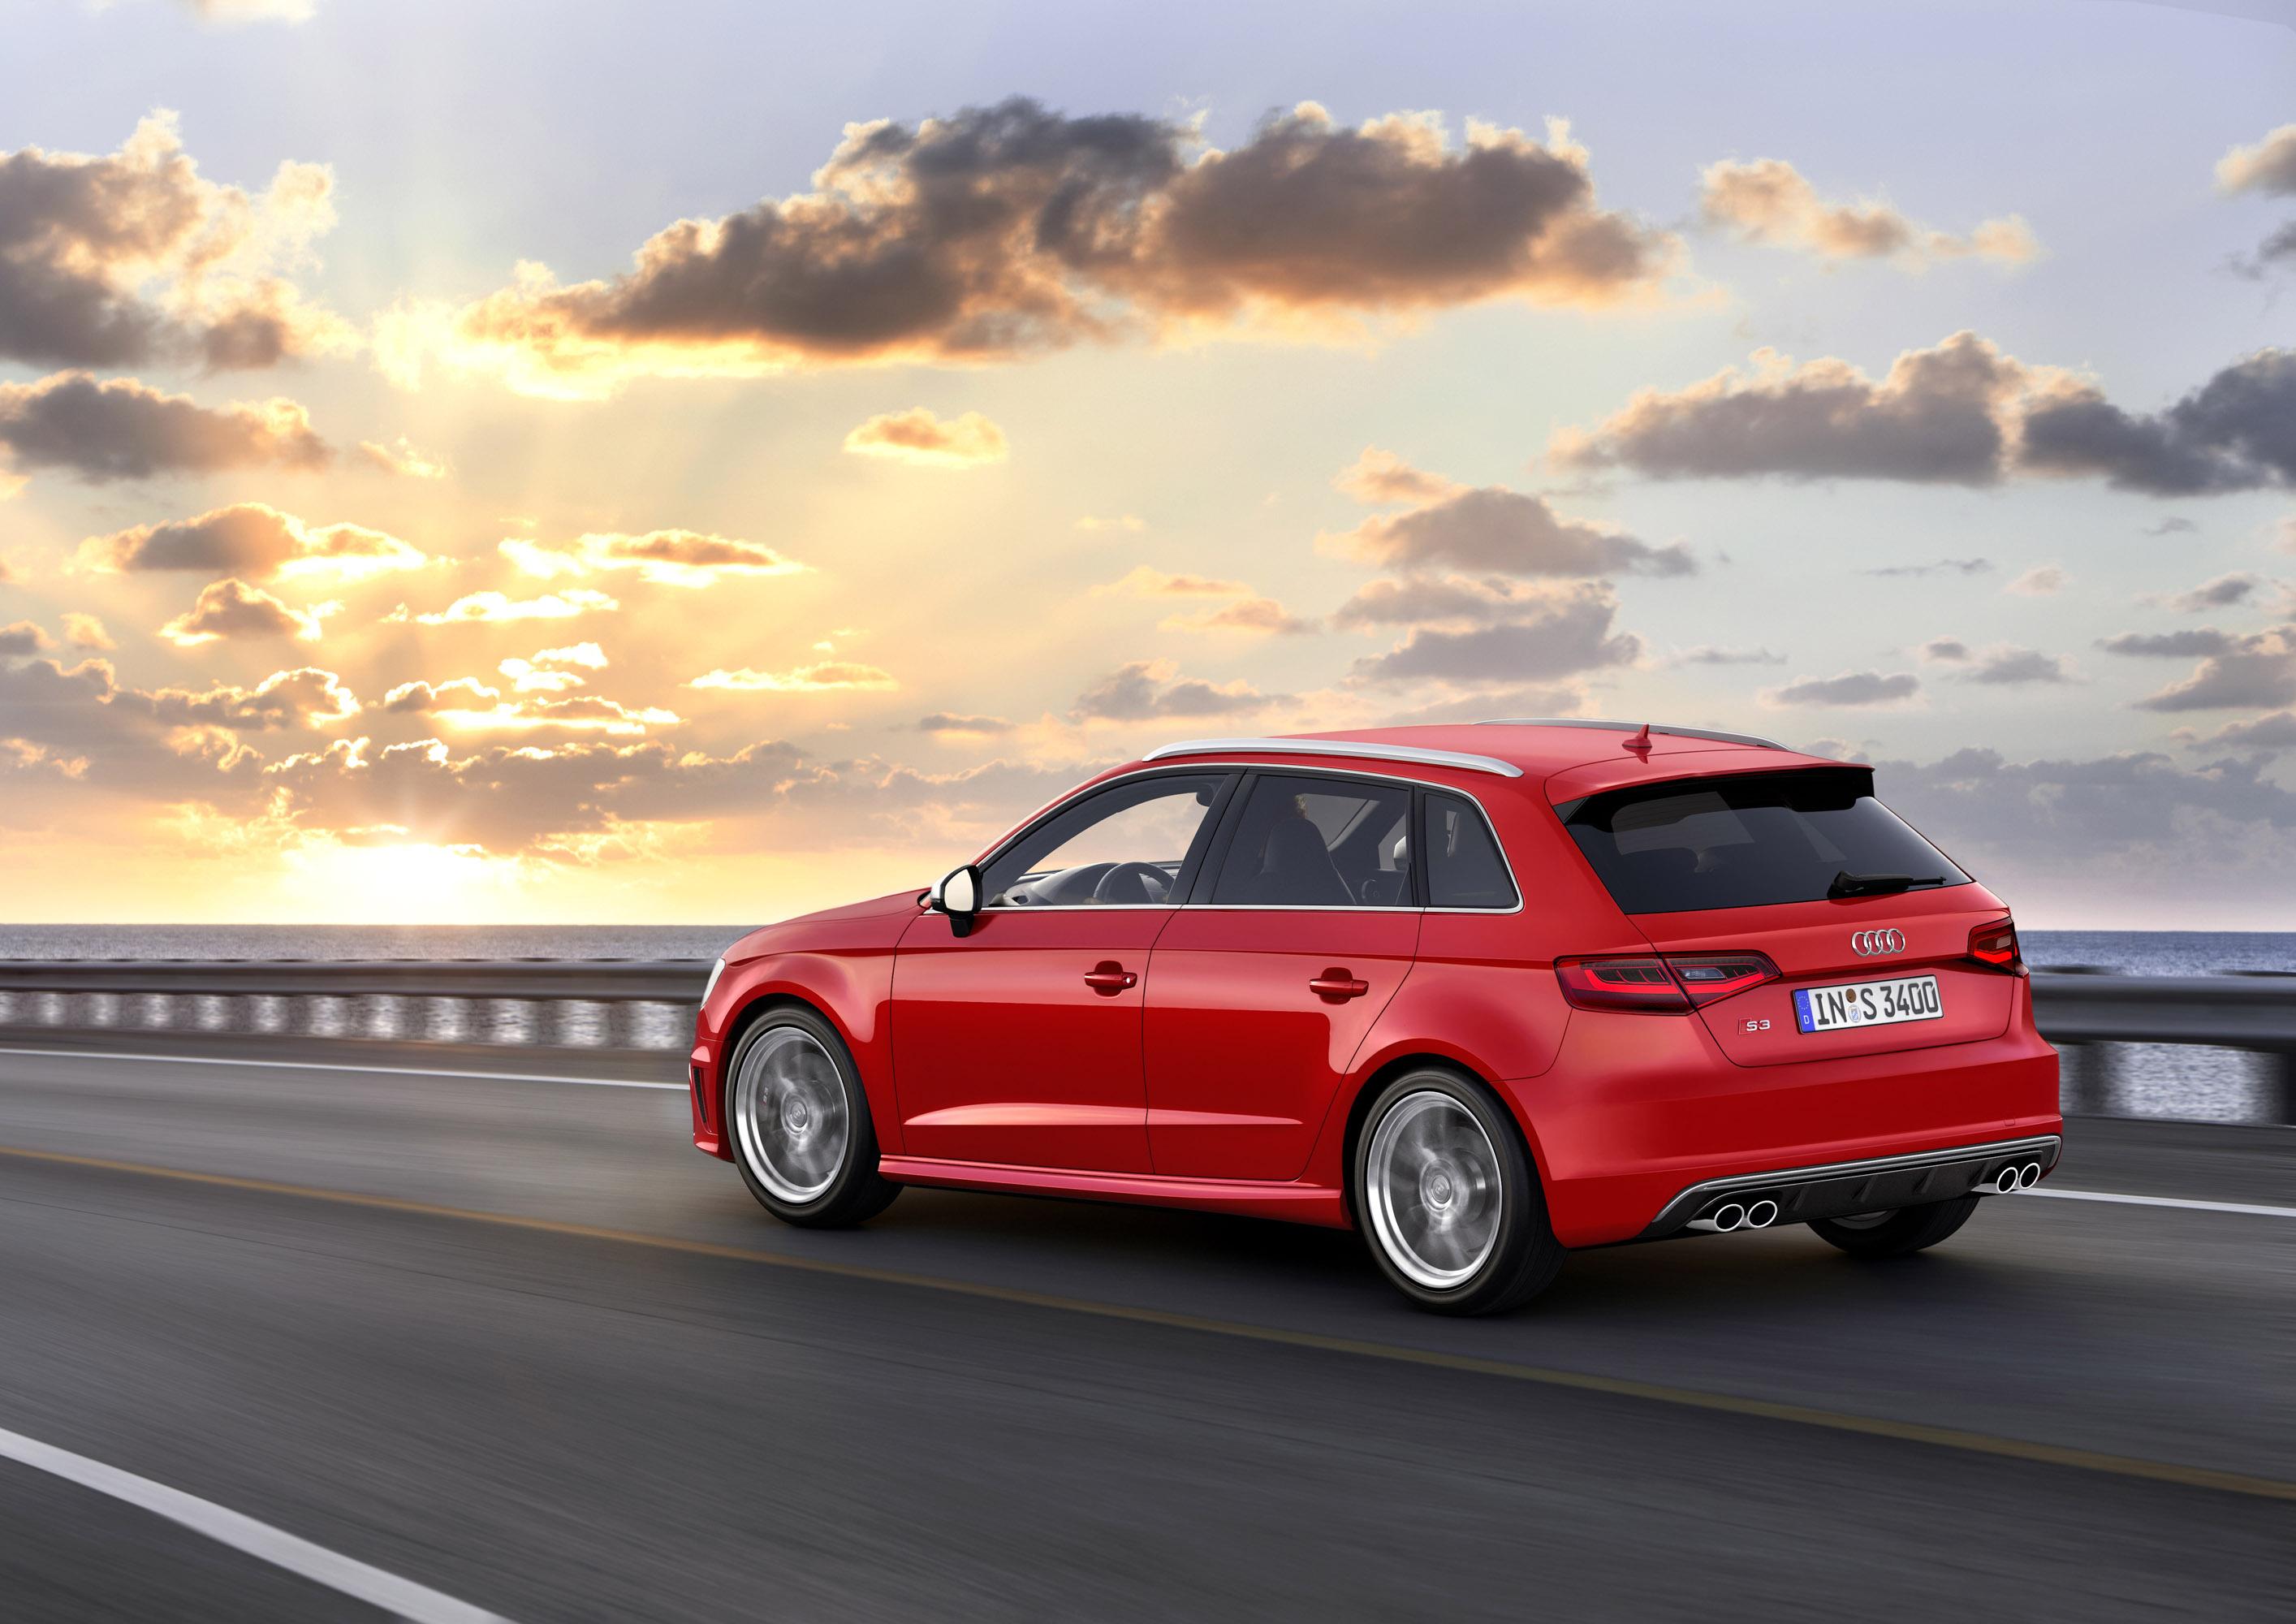 Audi-S3-Sportback-side-view-sunset